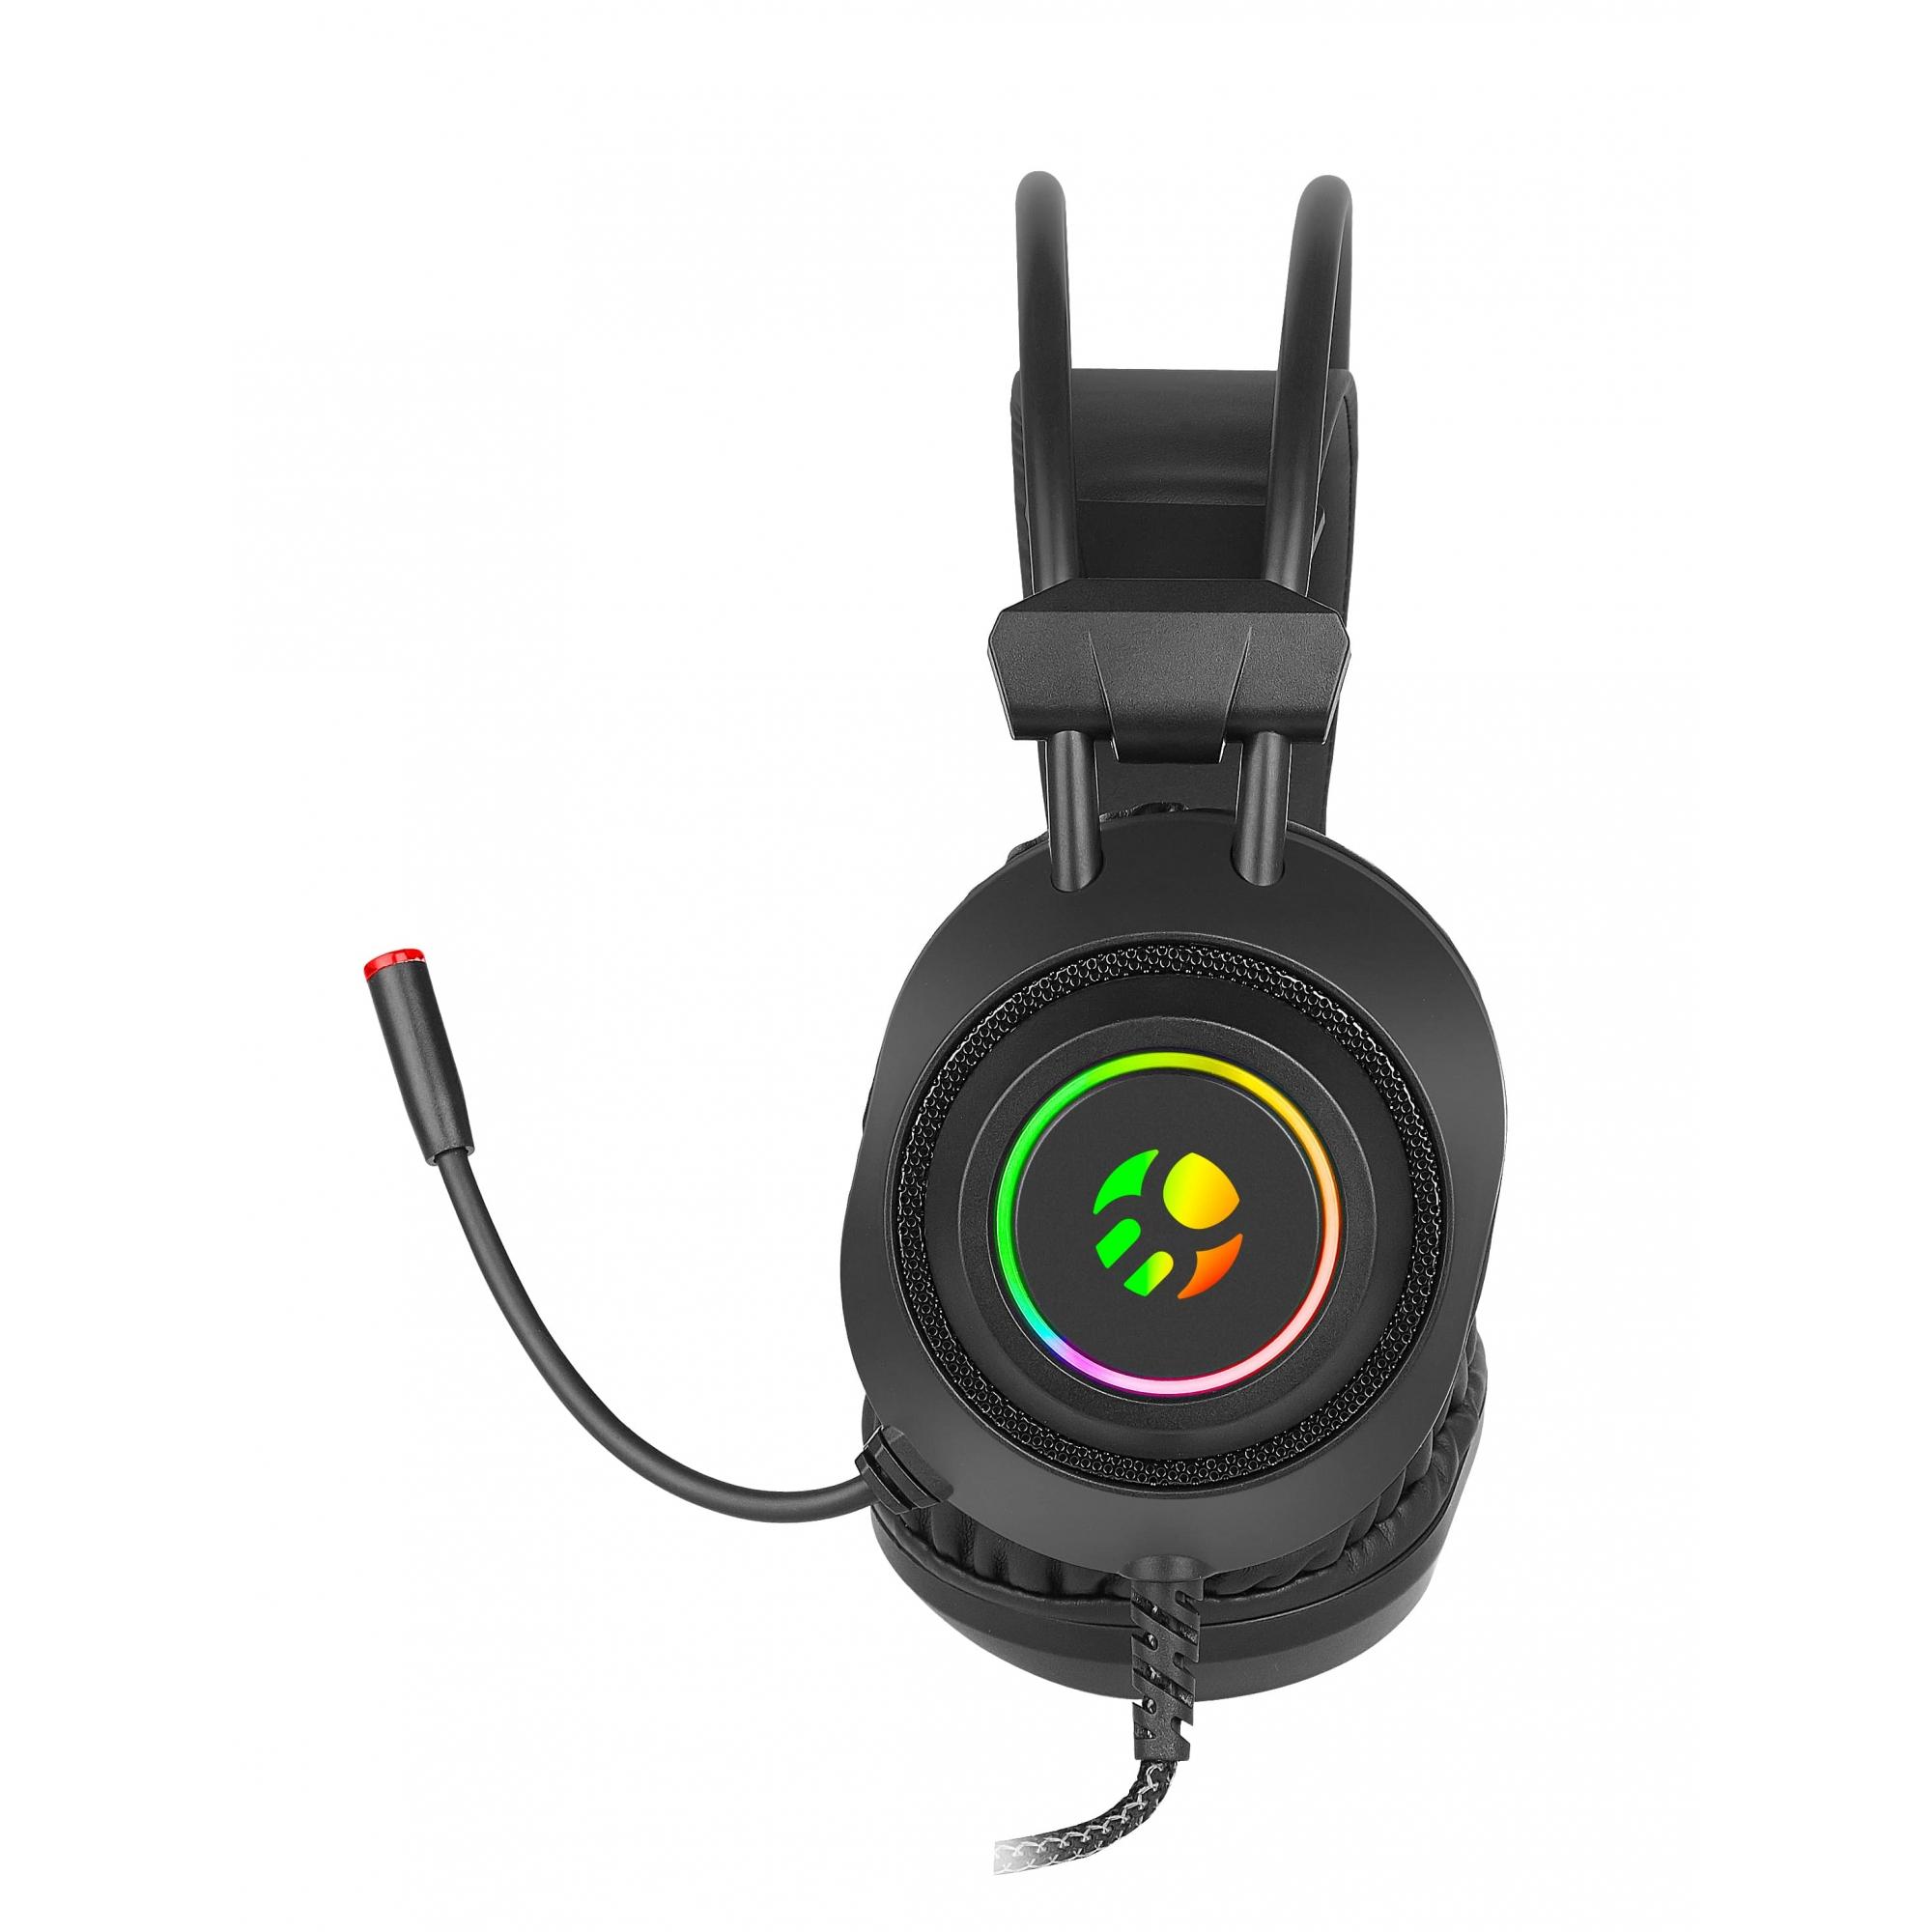 Headset Gamer Bluecase, Led RGB, P2 / USB, Compativel com PS4 - BHG-502